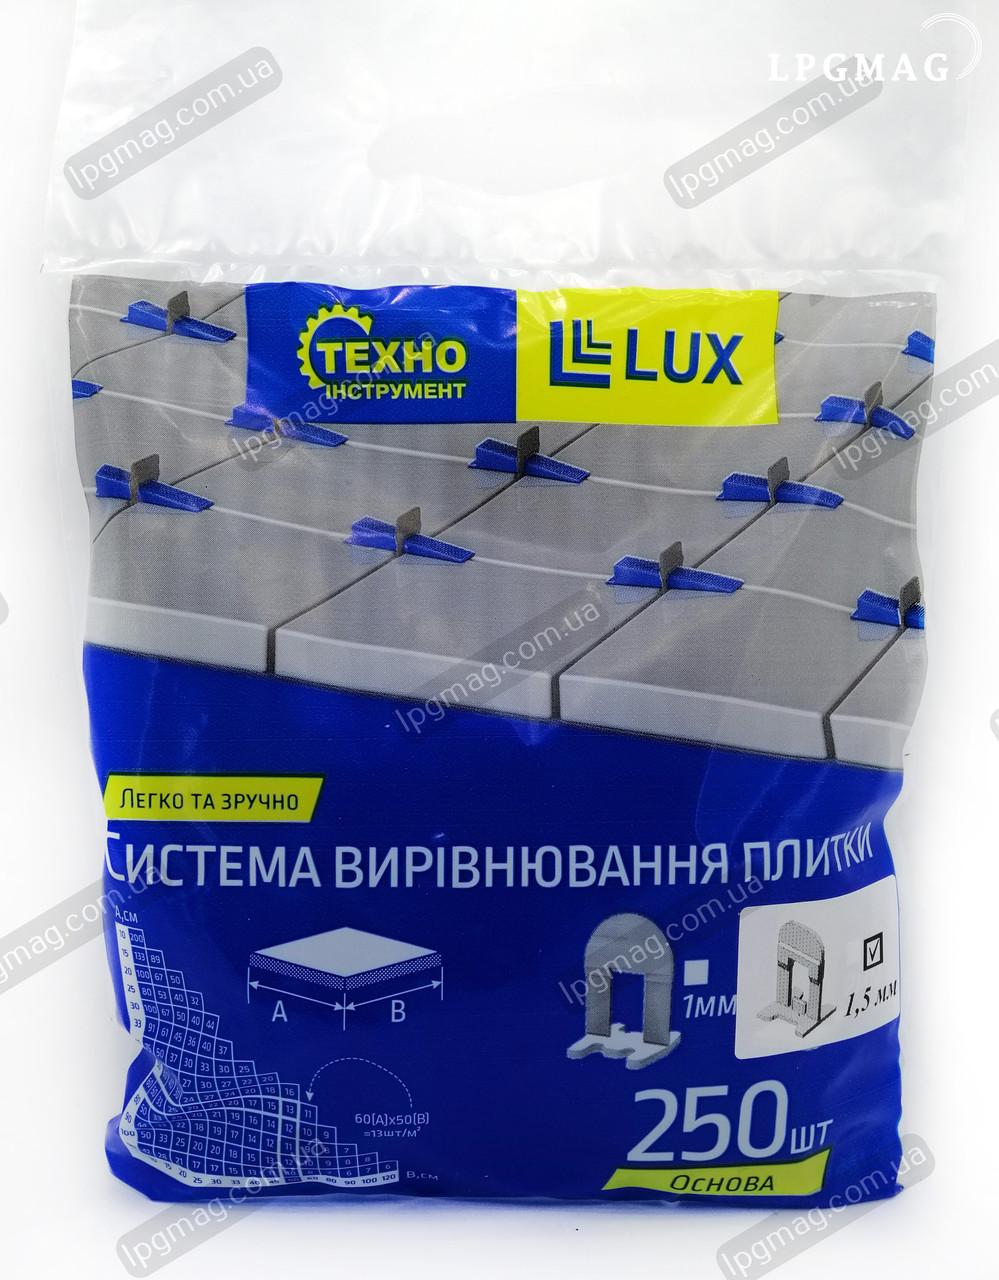 1,5 мм (Основа 250 шт.) Система выравнивания плитки LUX